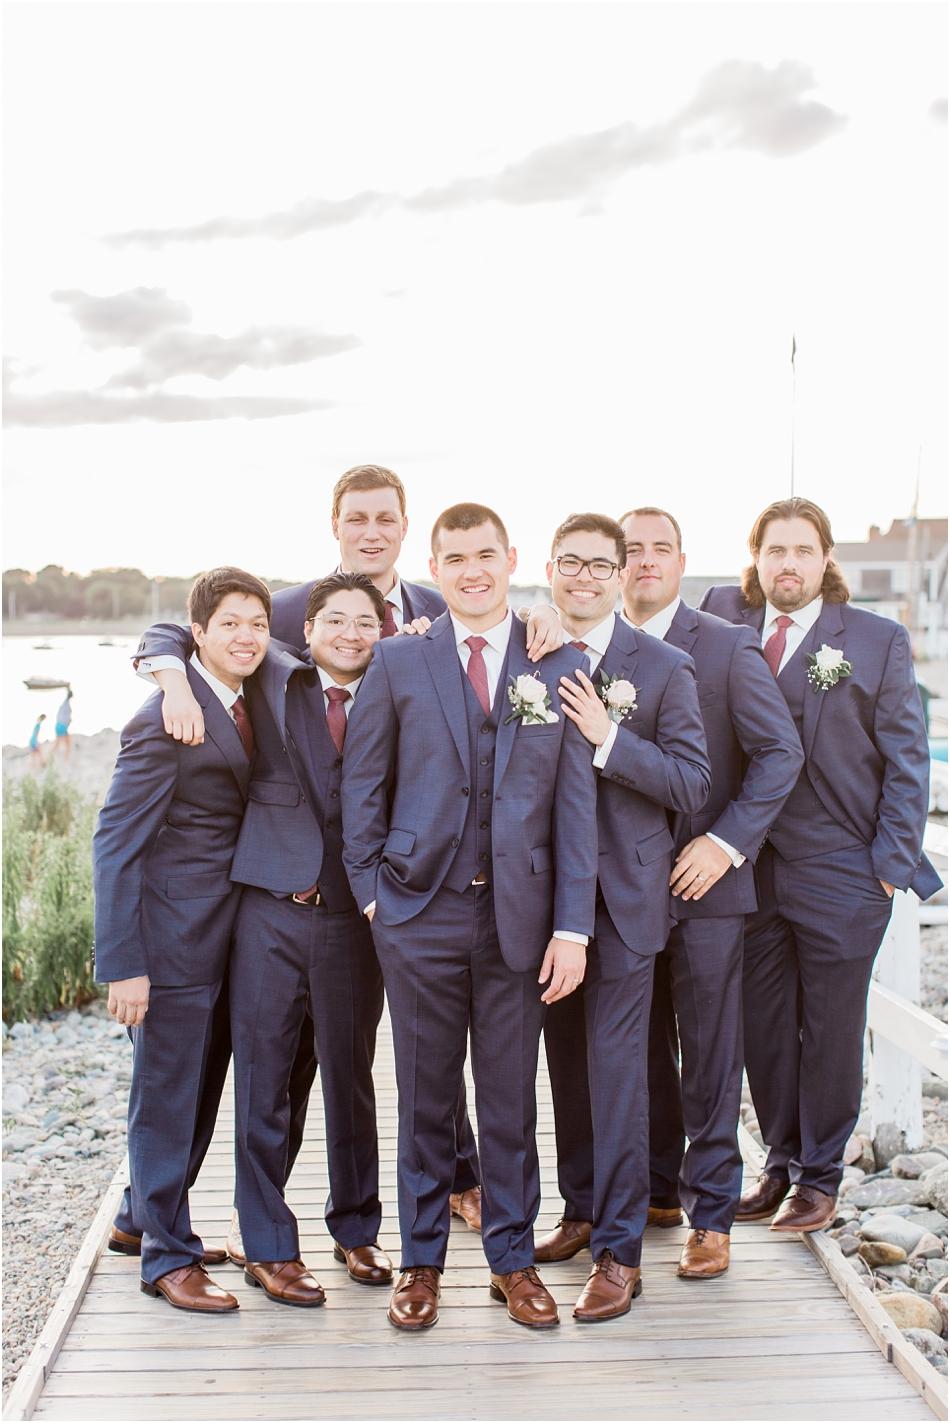 red_lion_inn_scituate_light_cape_cod_boston_new_england_wedding_photographer_Meredith_Jane_Photography_photo_2253.jpg